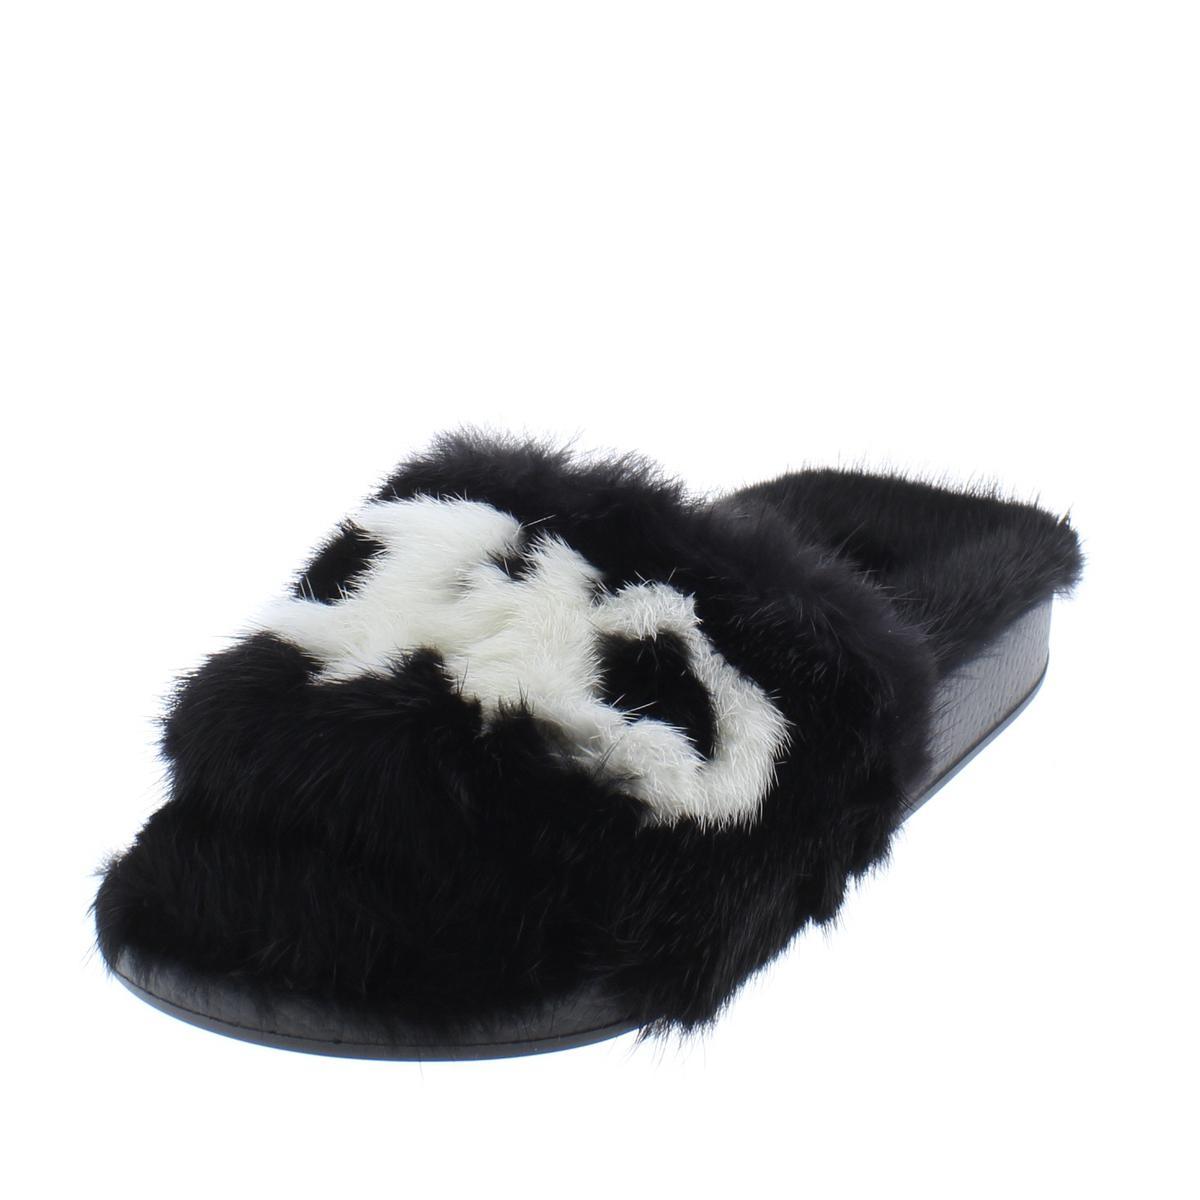 ad833c457c9 Details about salvatore ferragamo womens groove mink fur pool slide slippers  shoes bhfo jpg 1200x1200 Ferragamo